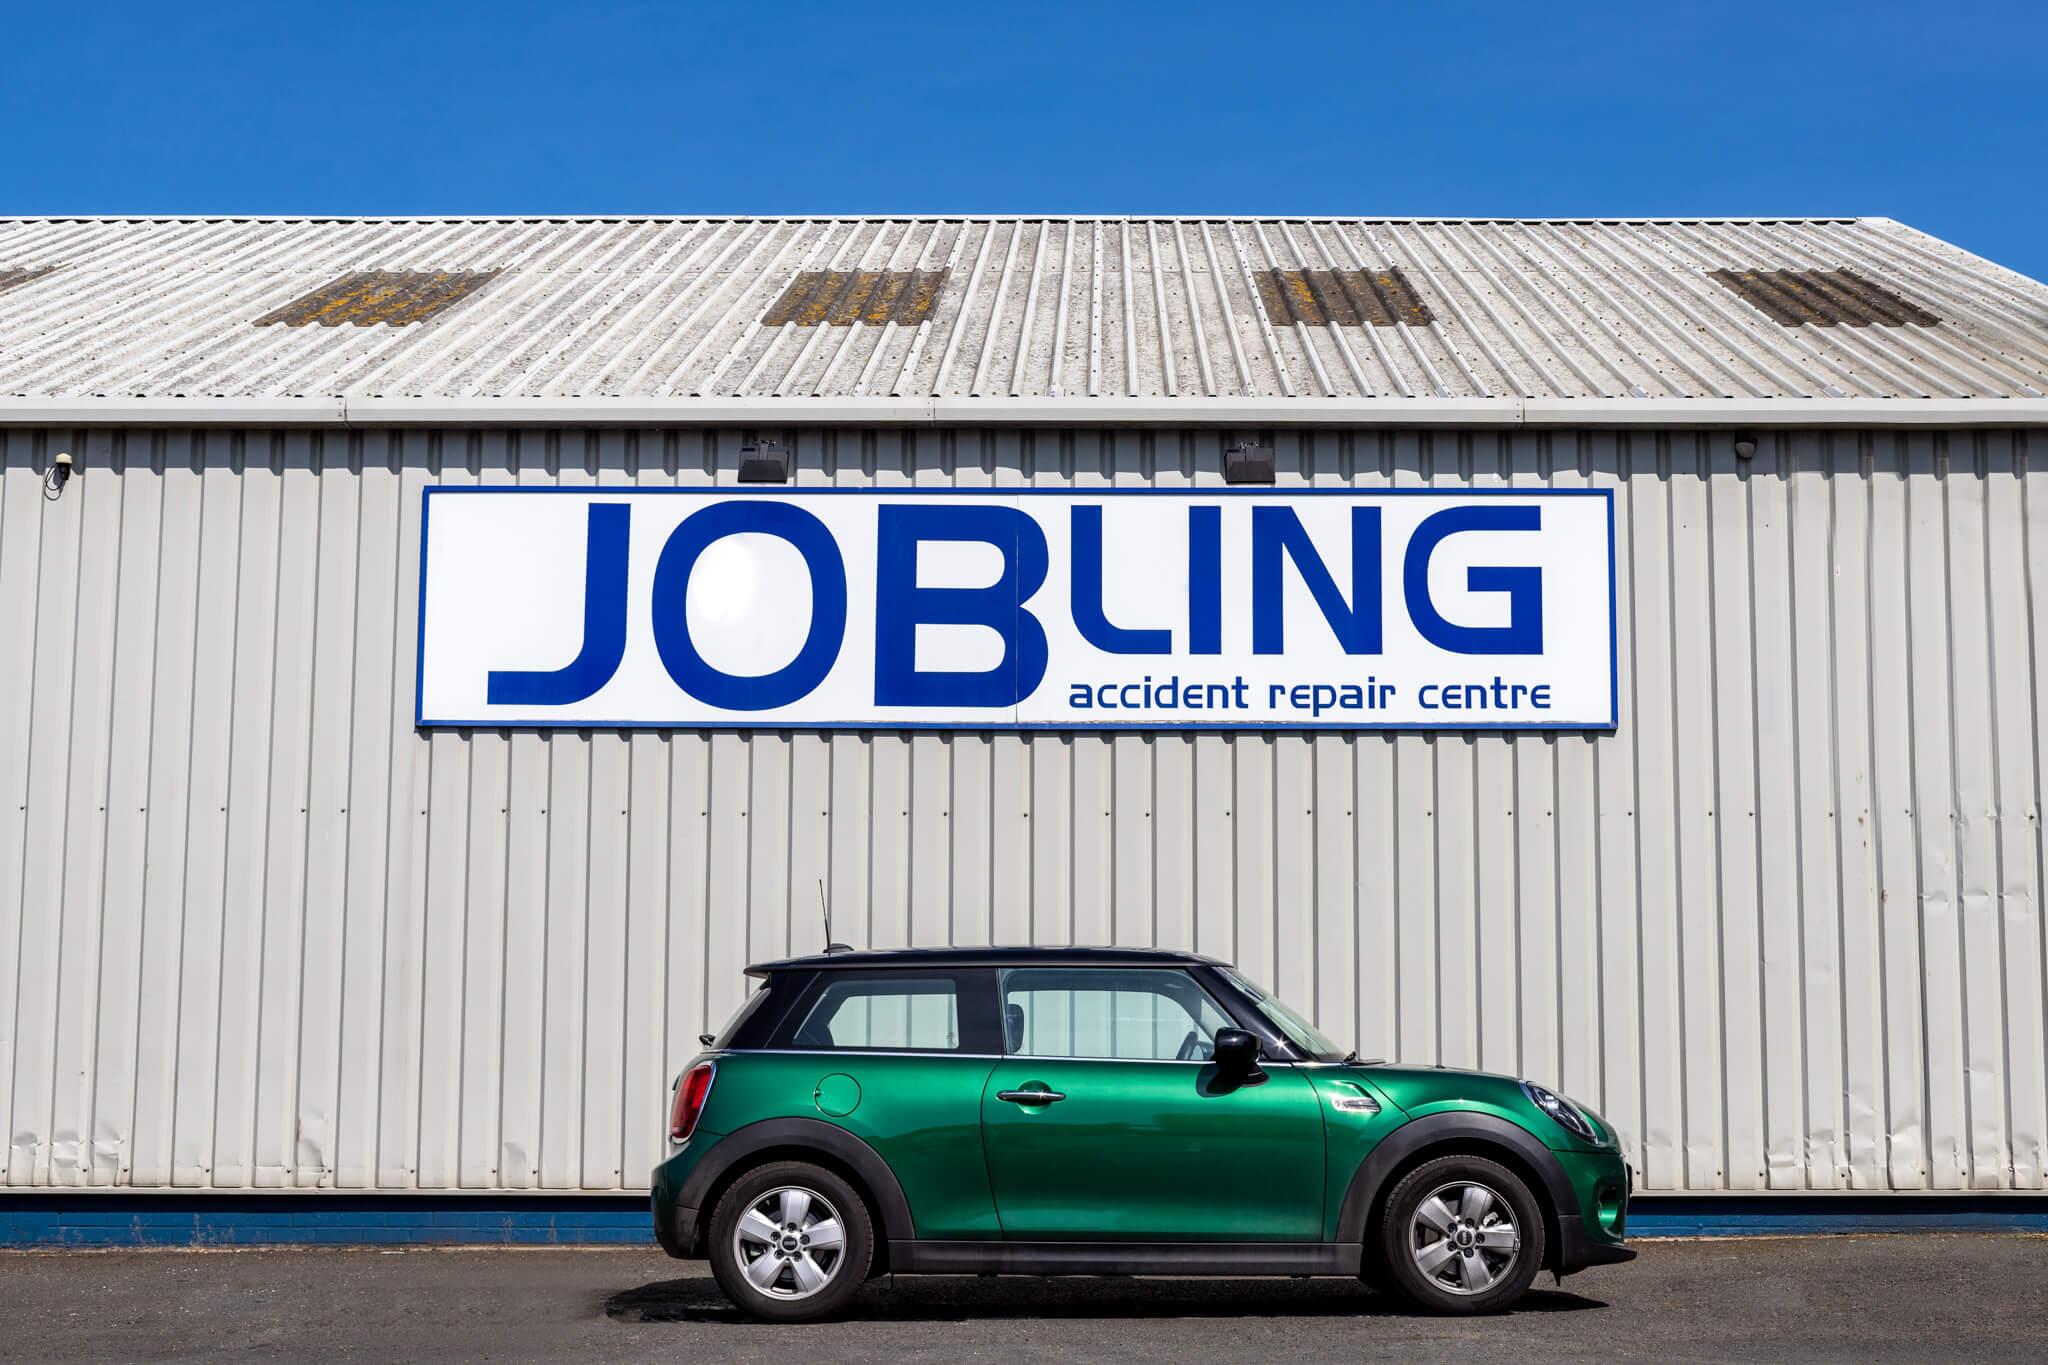 External view of Jobling Auto Repair Centre